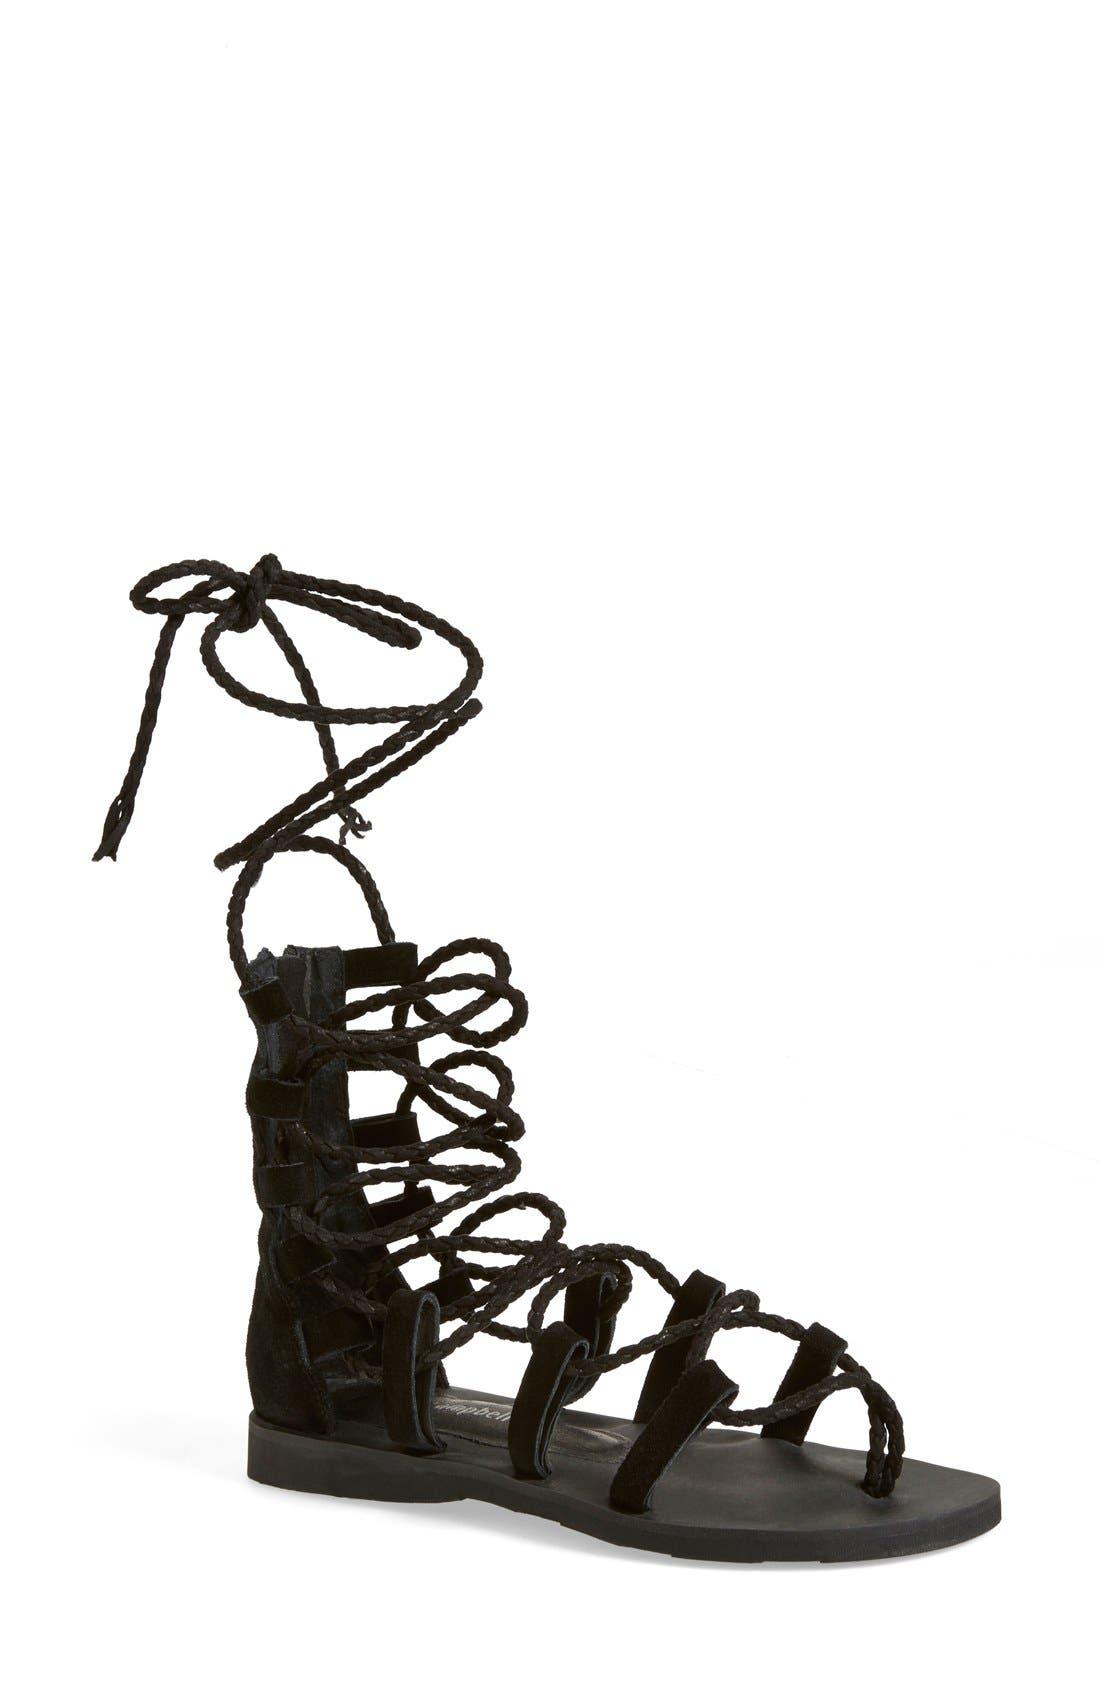 'Hola' Lace-Up Gladiator Sandal,                         Main,                         color, 001